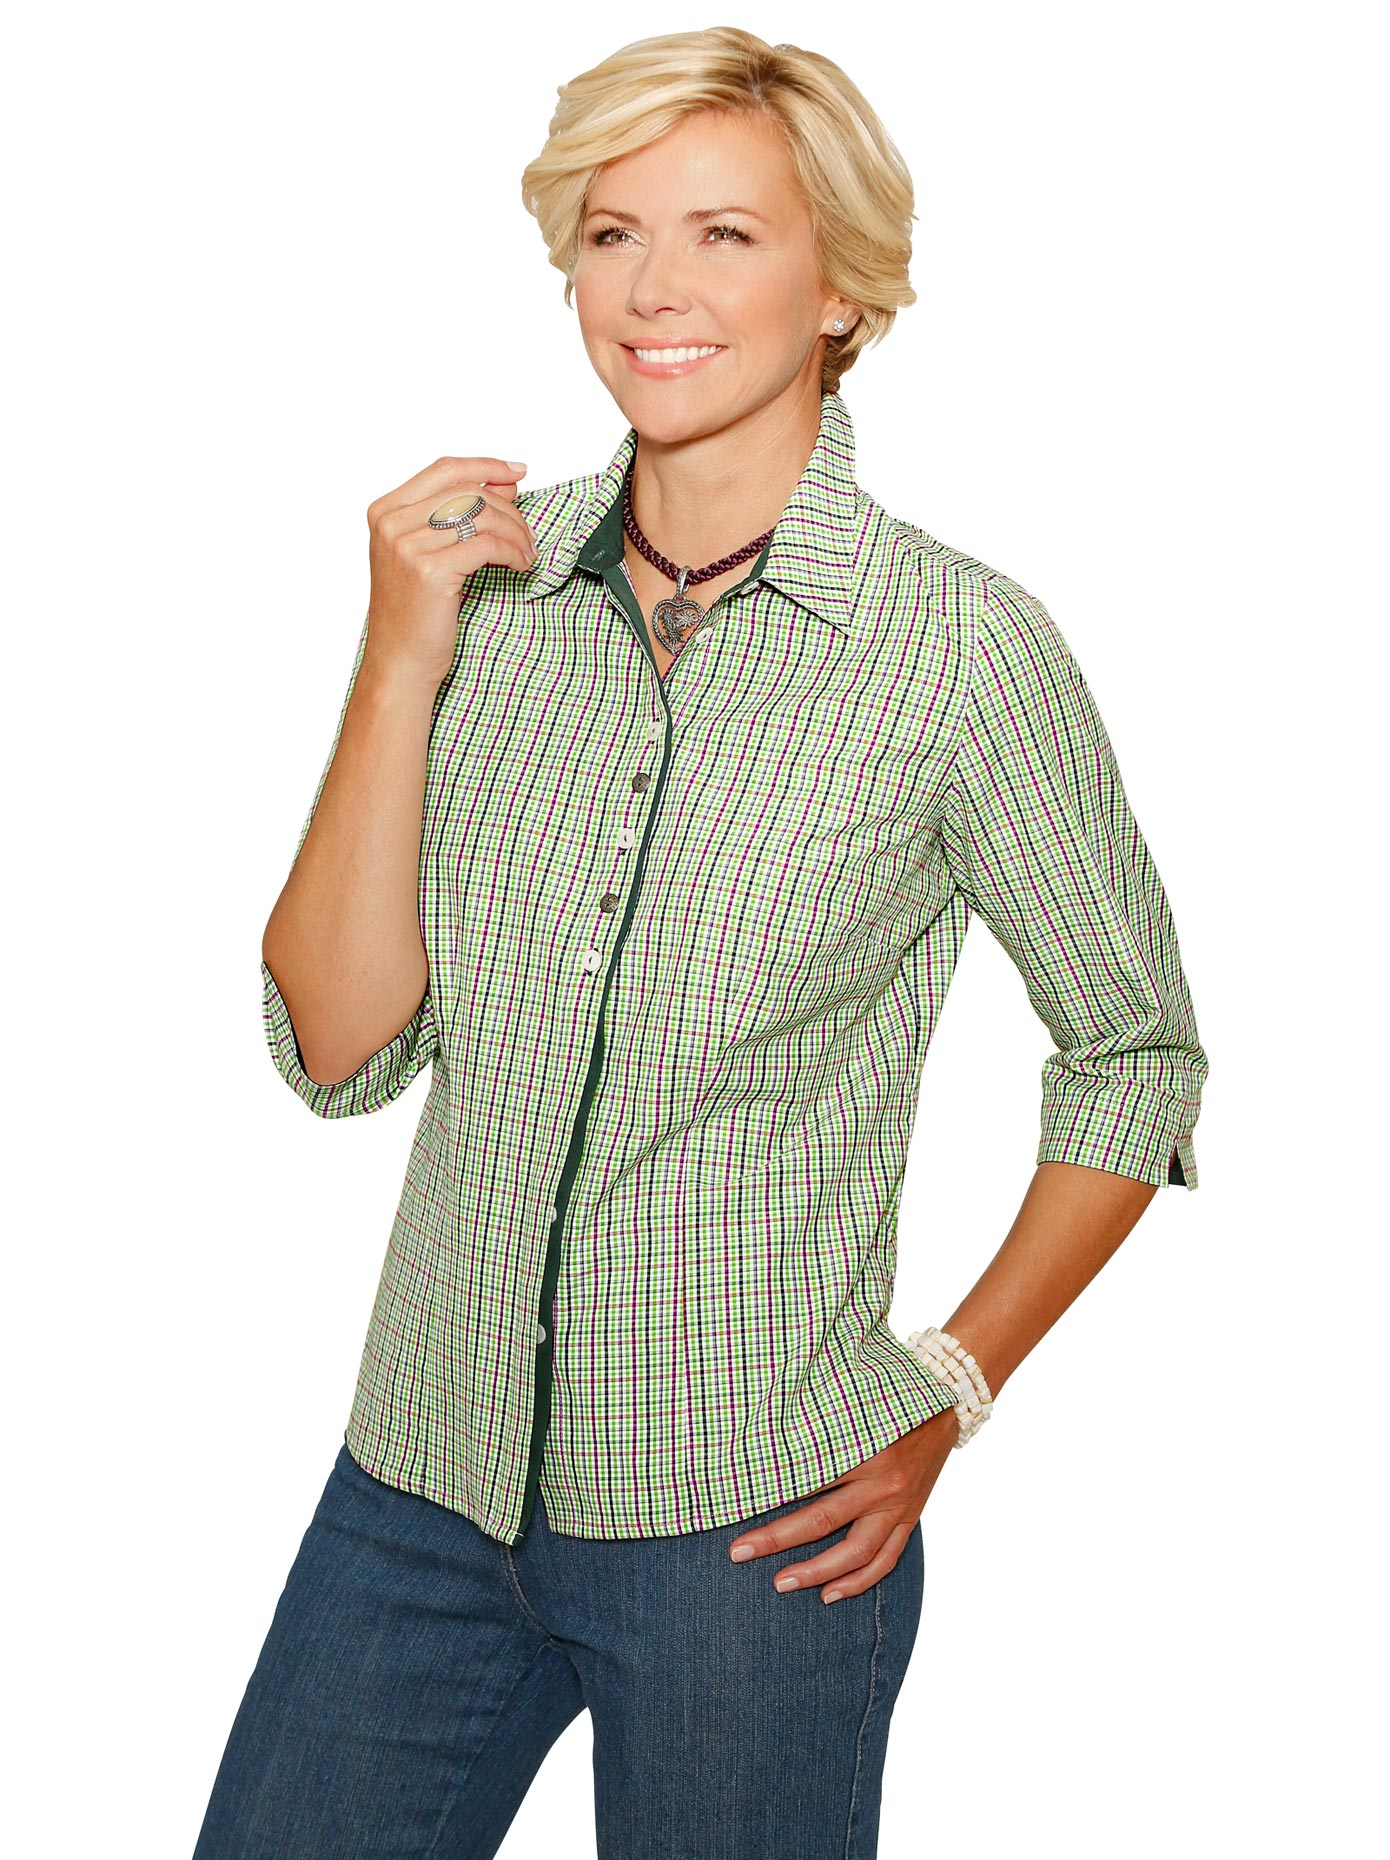 Classic Bluse im attraktiven Webkaro-Dessin